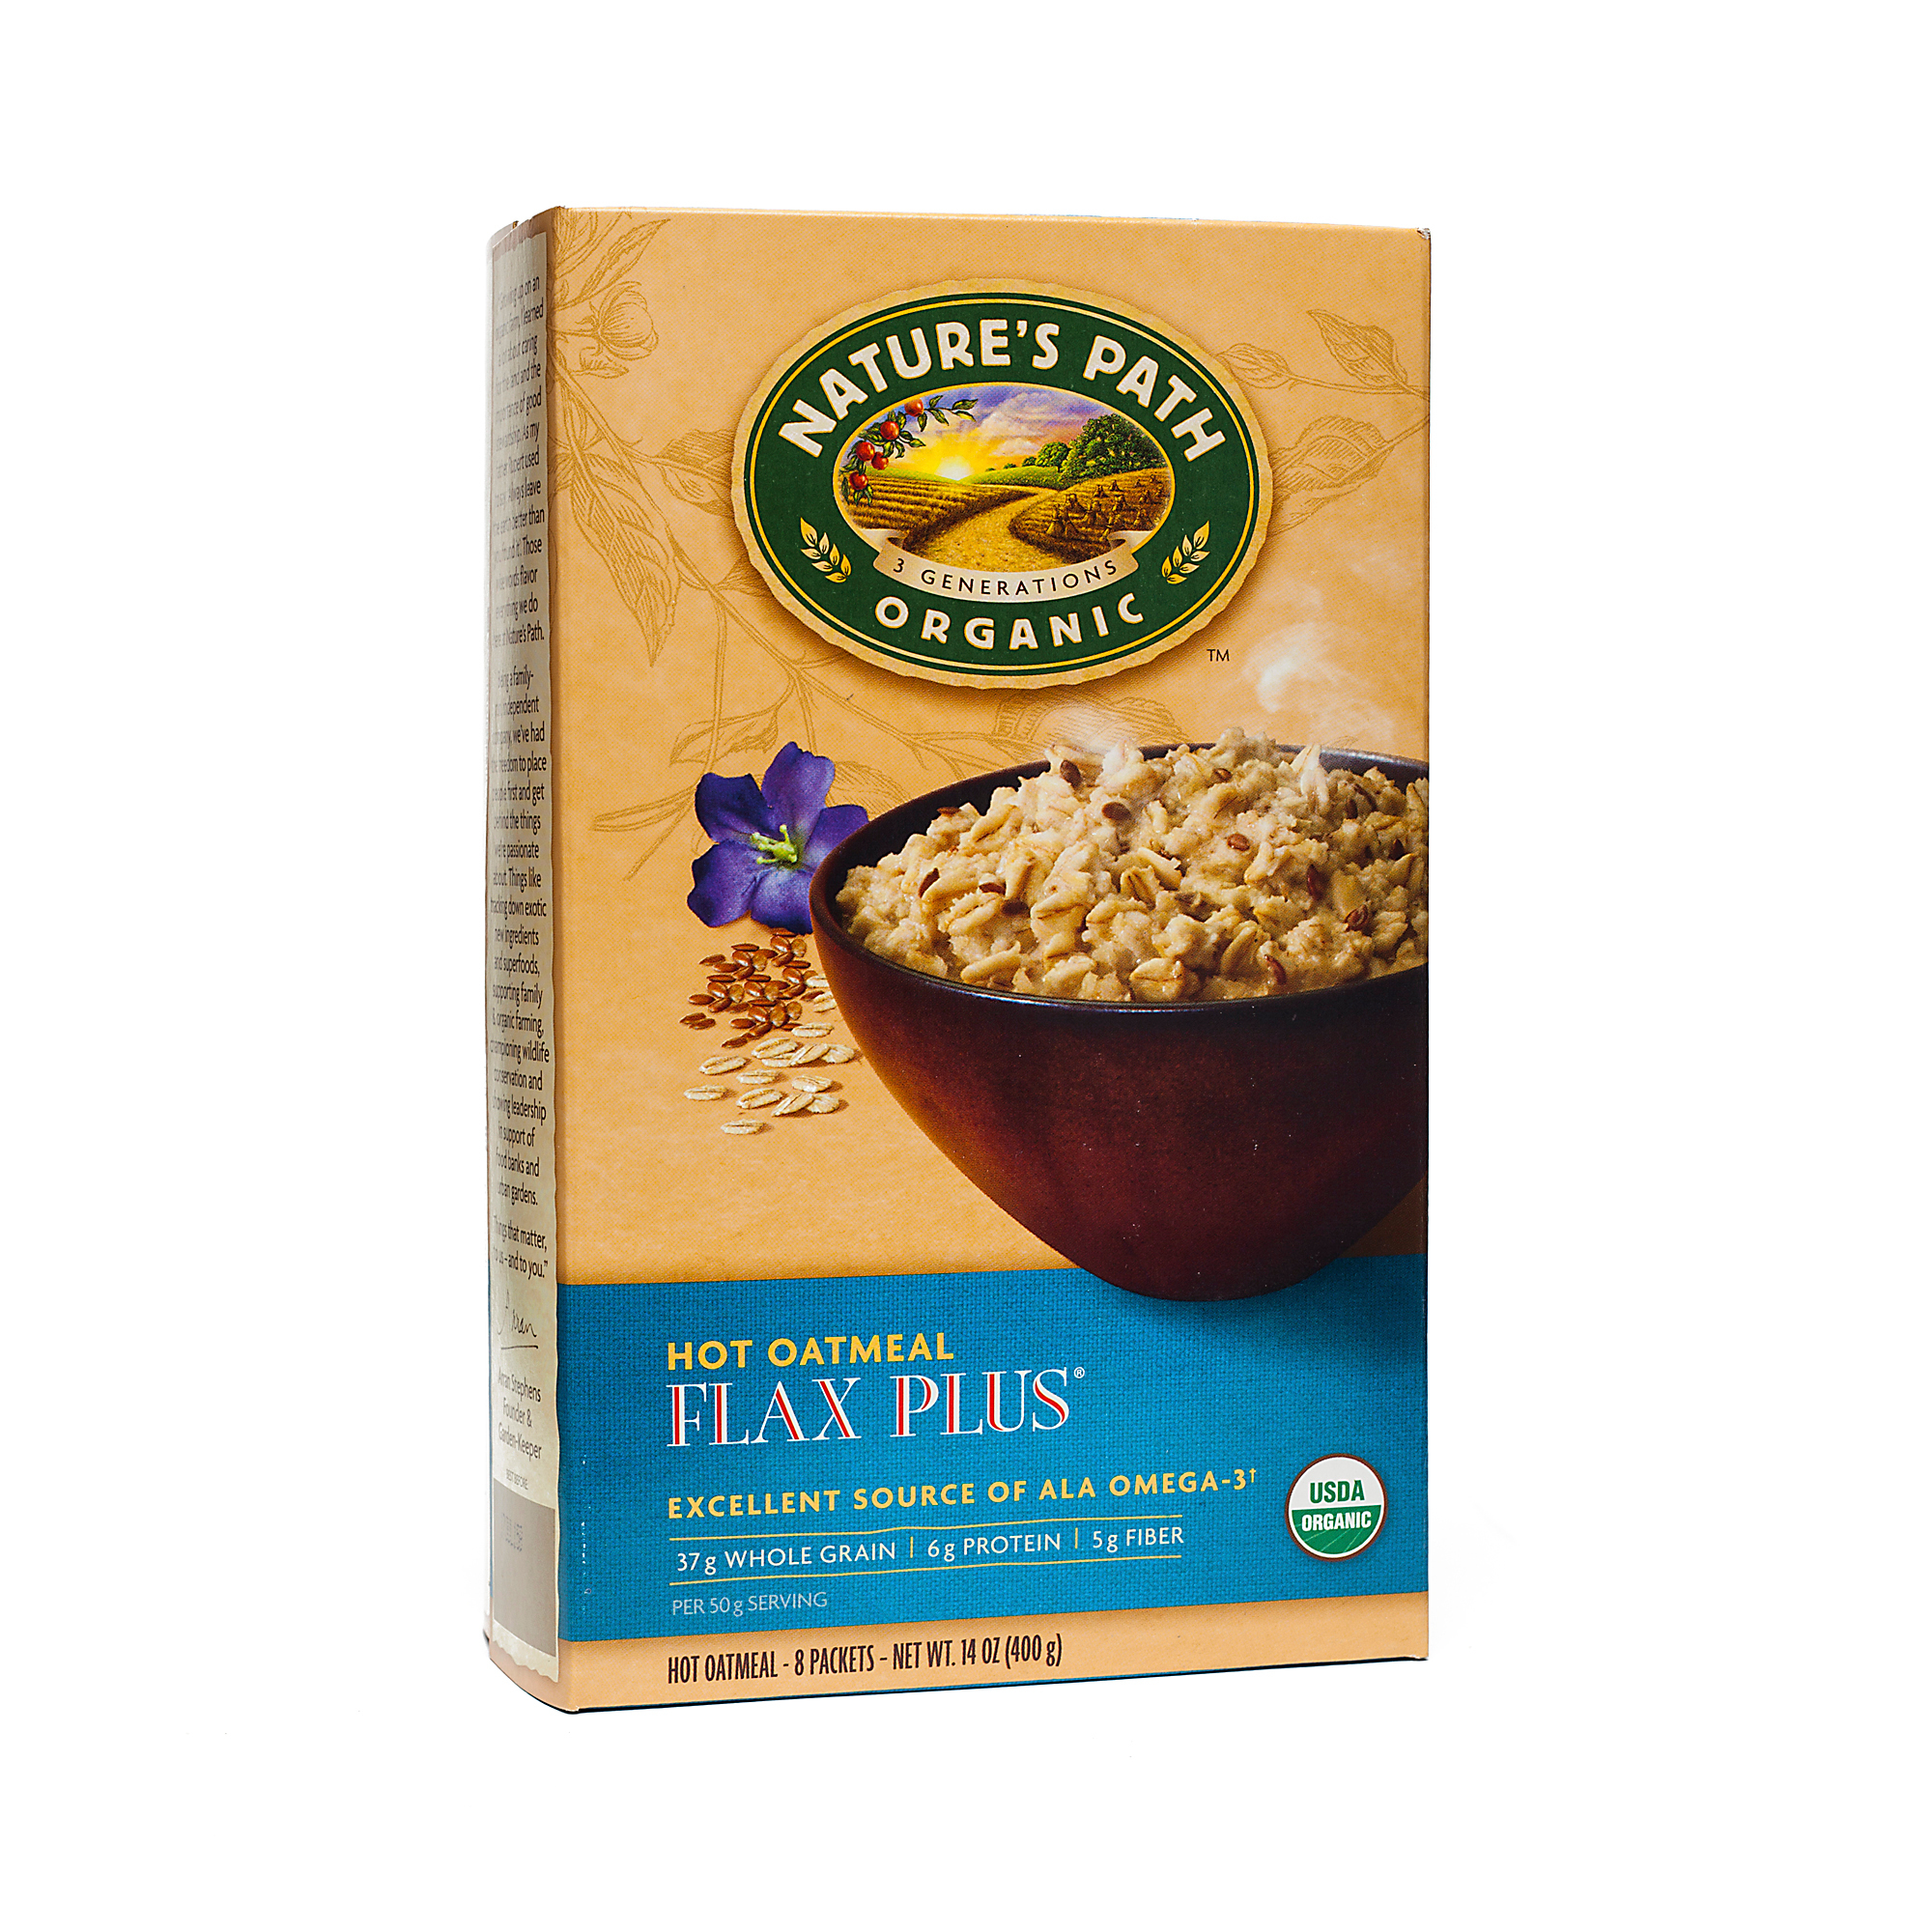 058449450023 1 The Coffee Bean And Tea Leaf K Cups